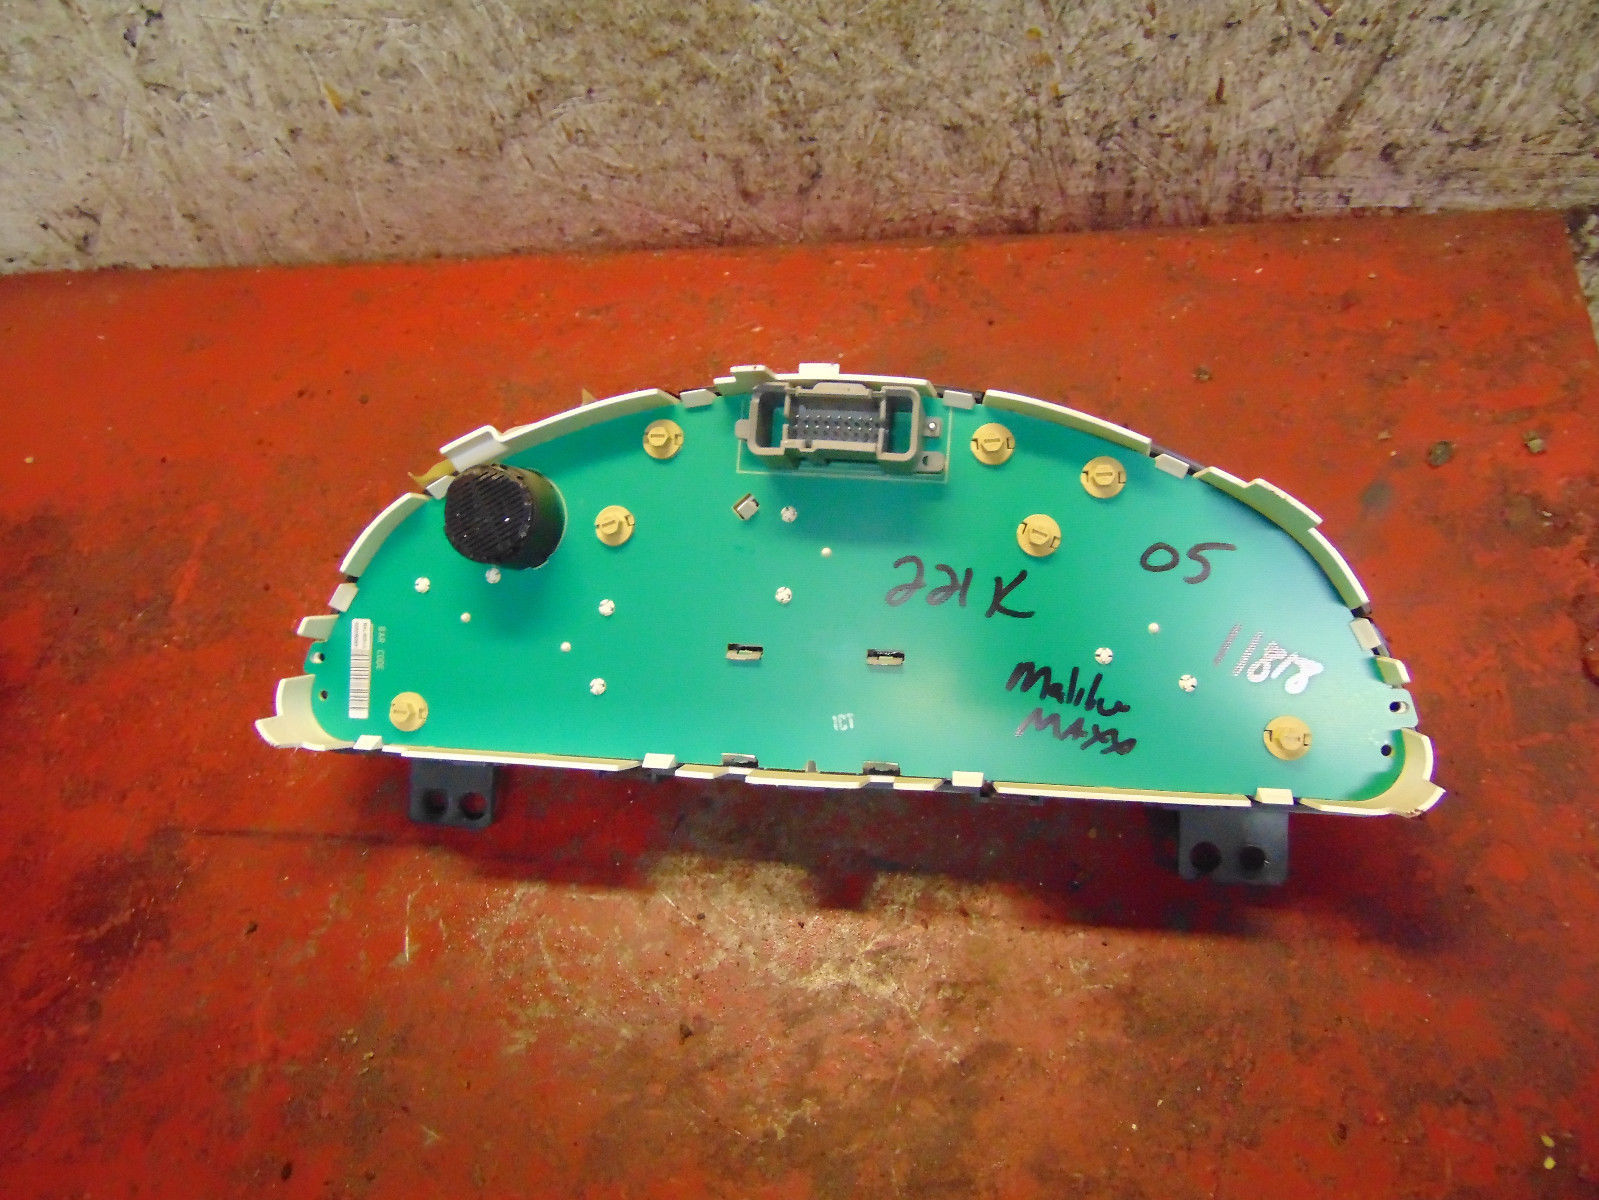 04 05 Chevy Malibu Maxx speedometer and 12 similar items